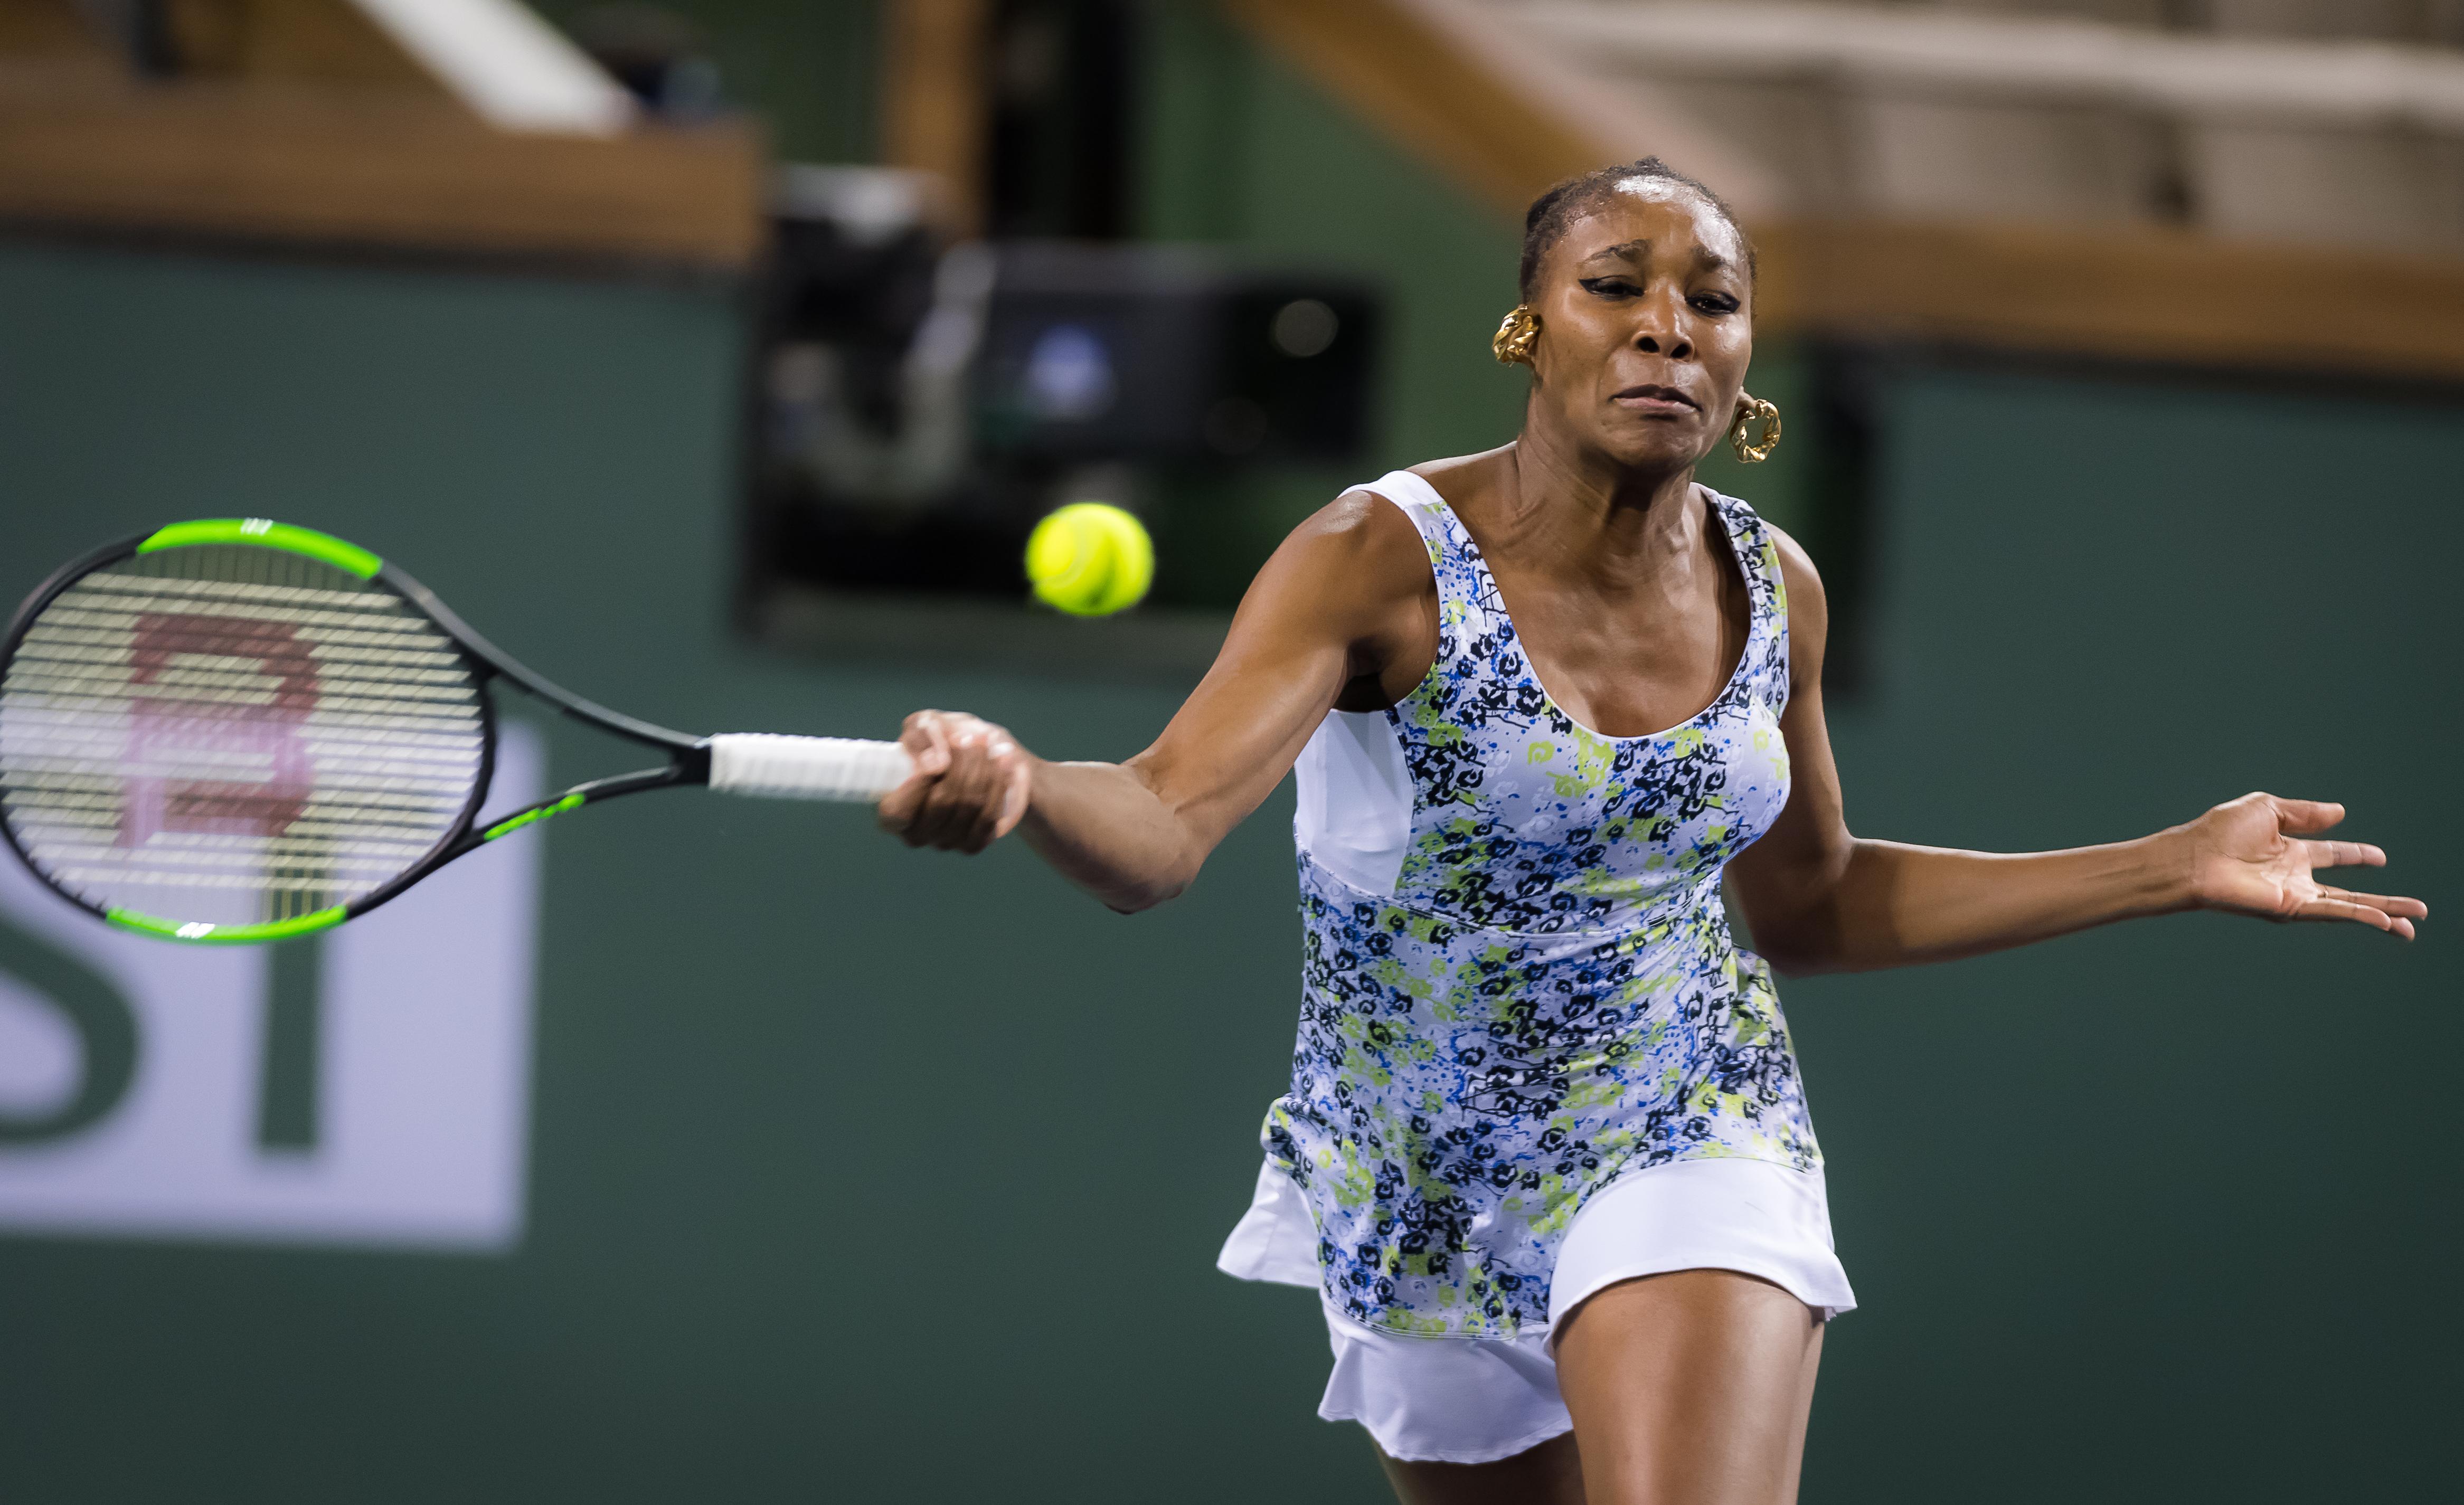 Venus Williams in the semi-final of the BNP Parobas Open, WTA Indian Wells